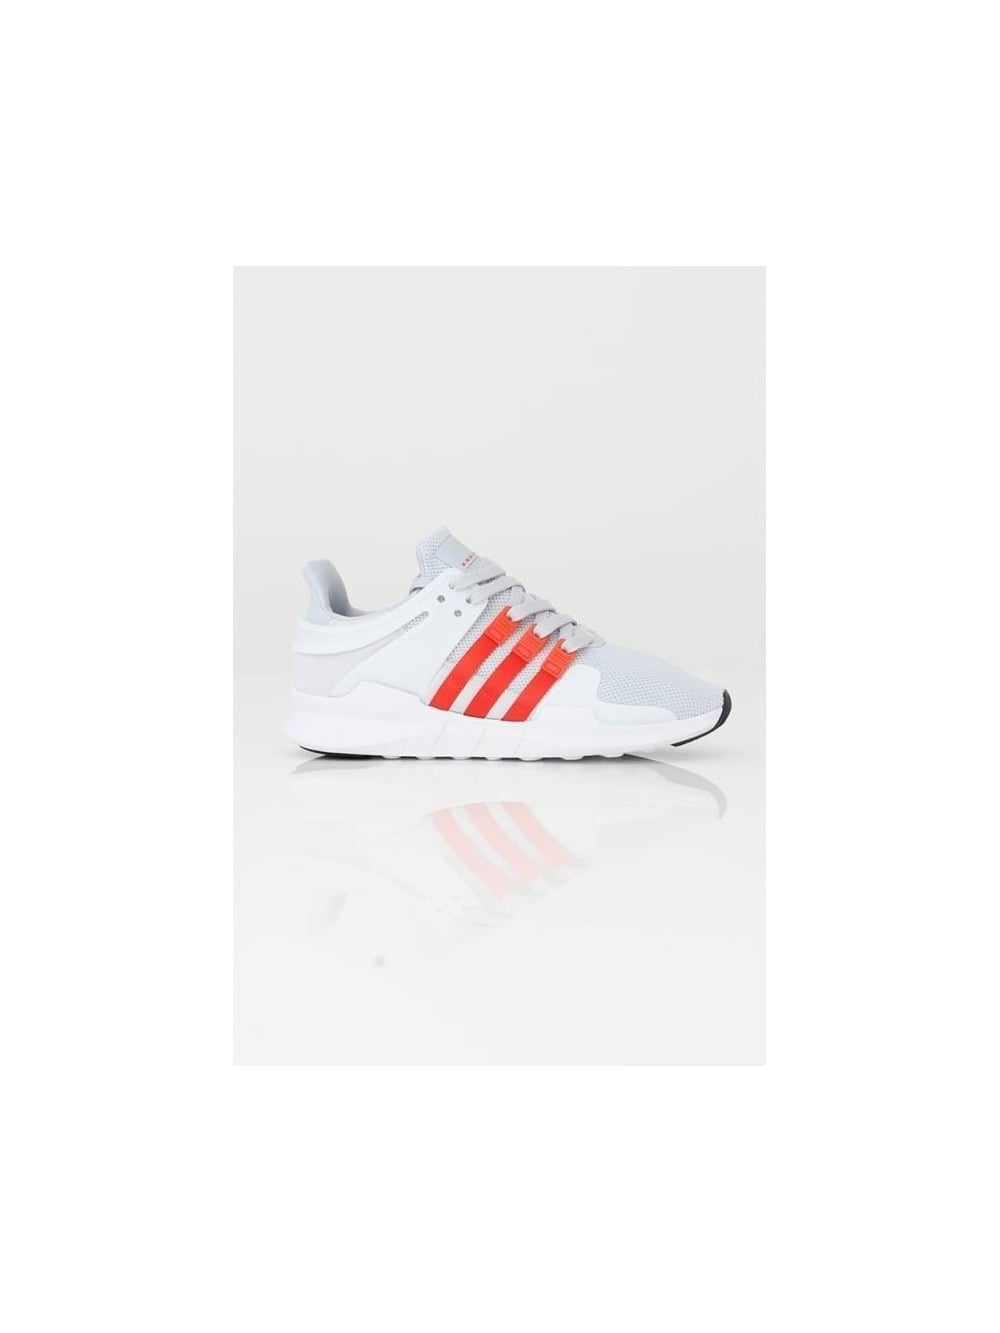 buy popular e7ca3 2df8d Adidas EQT Support ADV - White/Orange